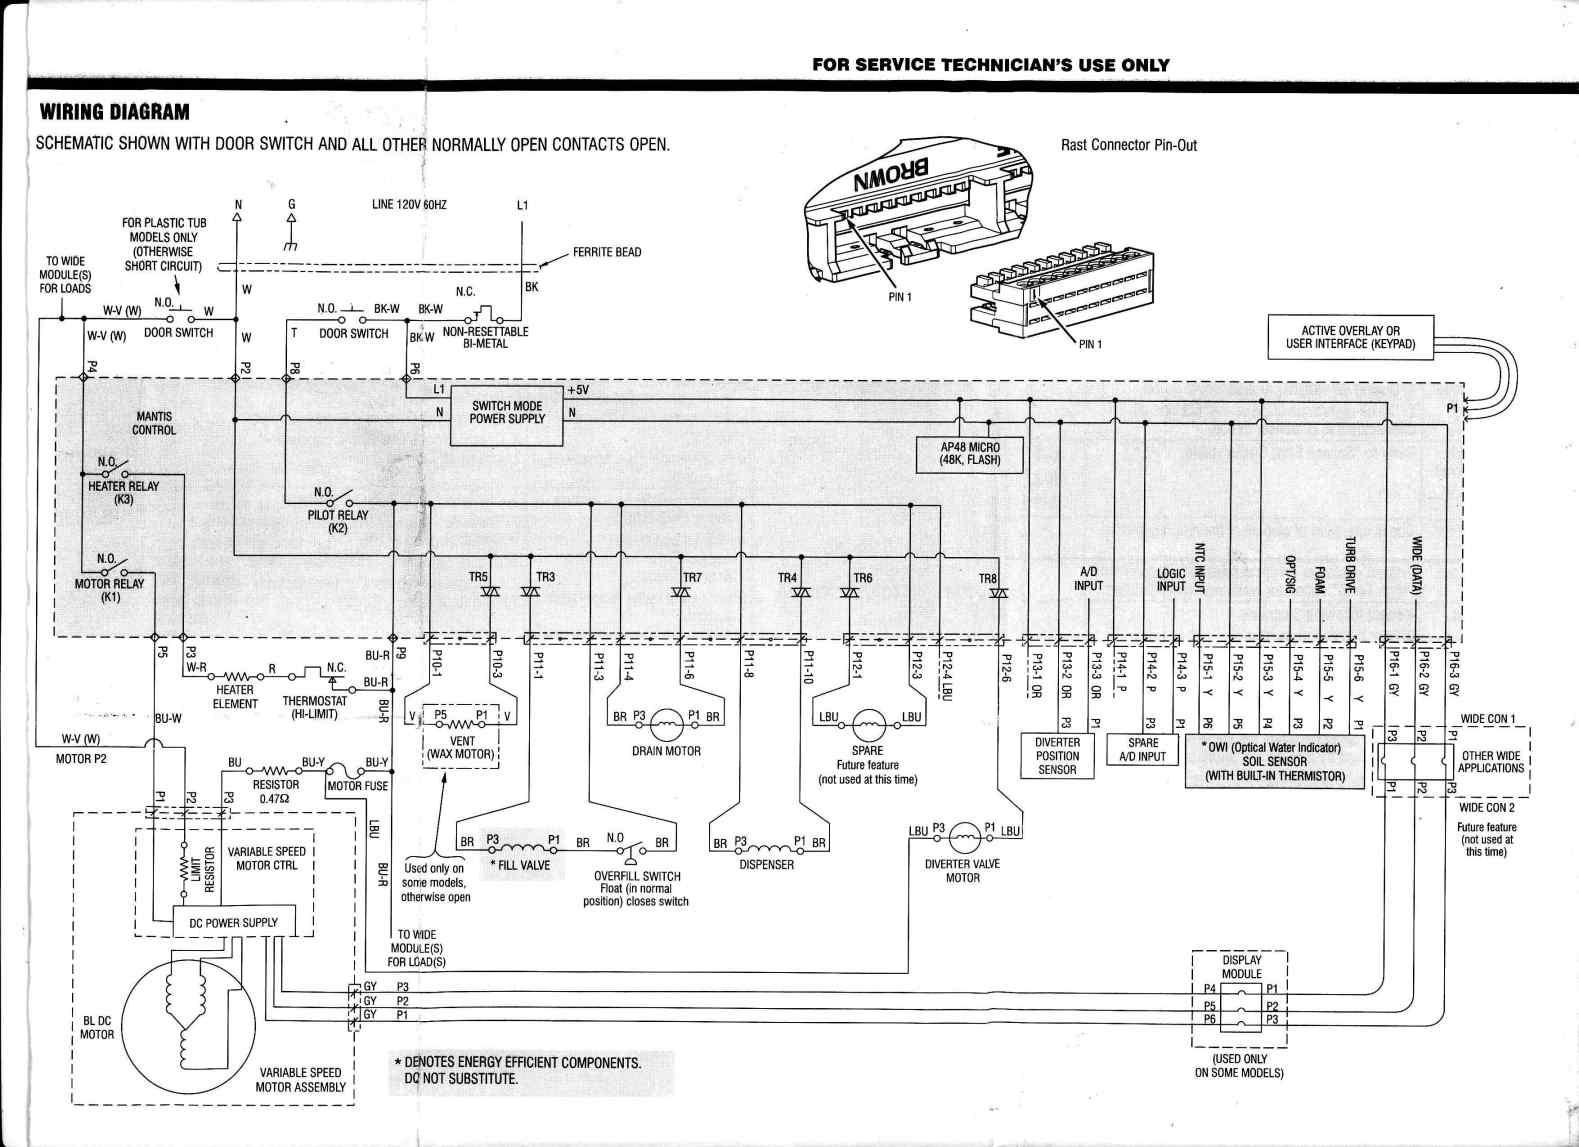 International 4700 Wiring Diagram Pdf Luxury International 4700 Wiring Diagram Pdf Lovely Lovely Kenmore